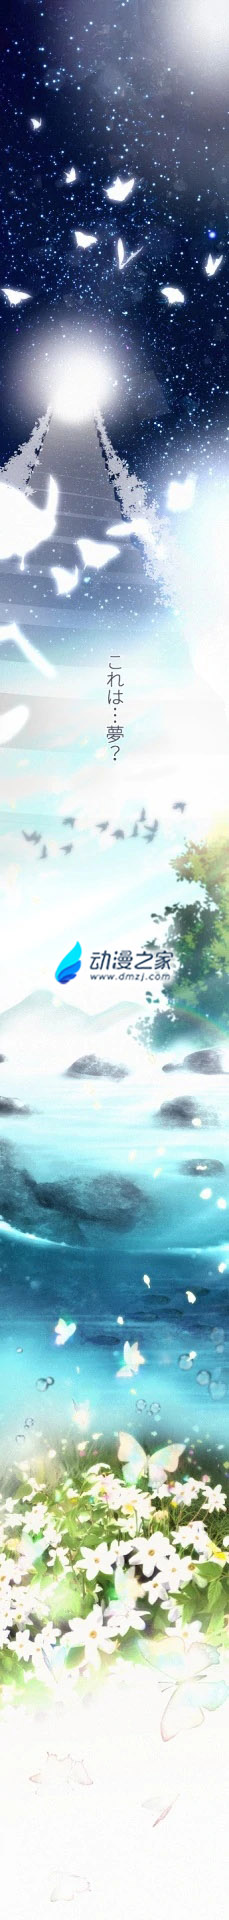 yomigaerikon_01.webp.jpg